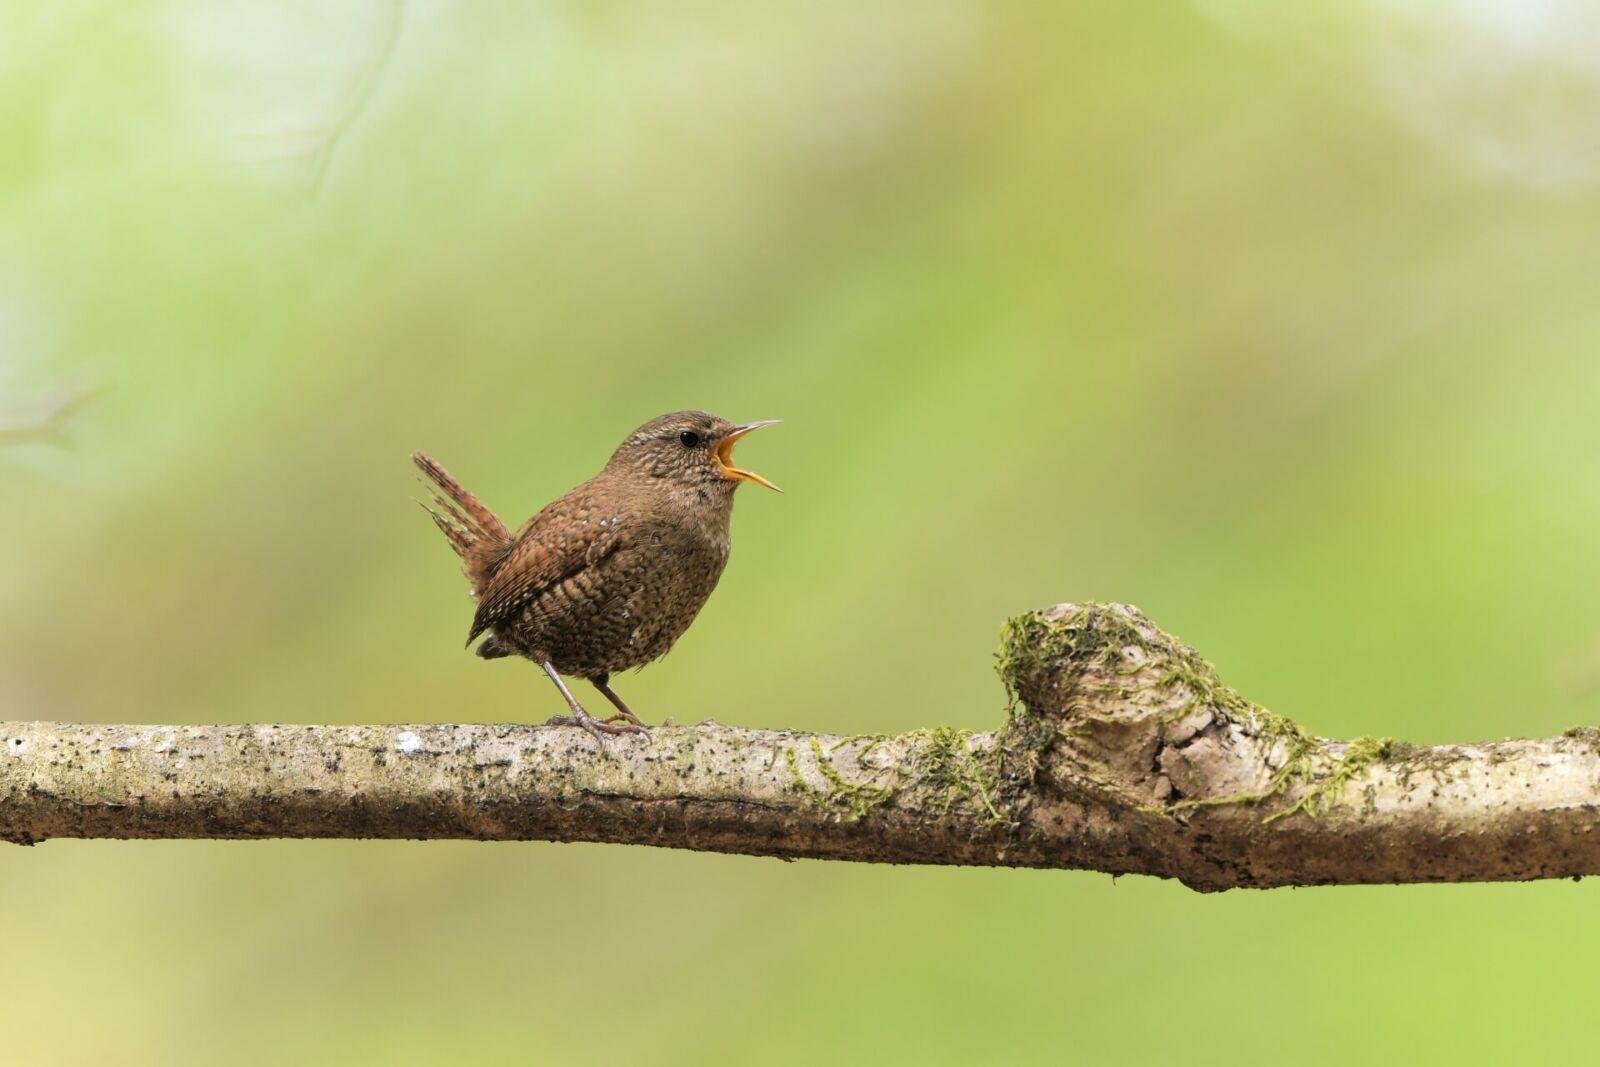 karuizawa-bird-wildlife